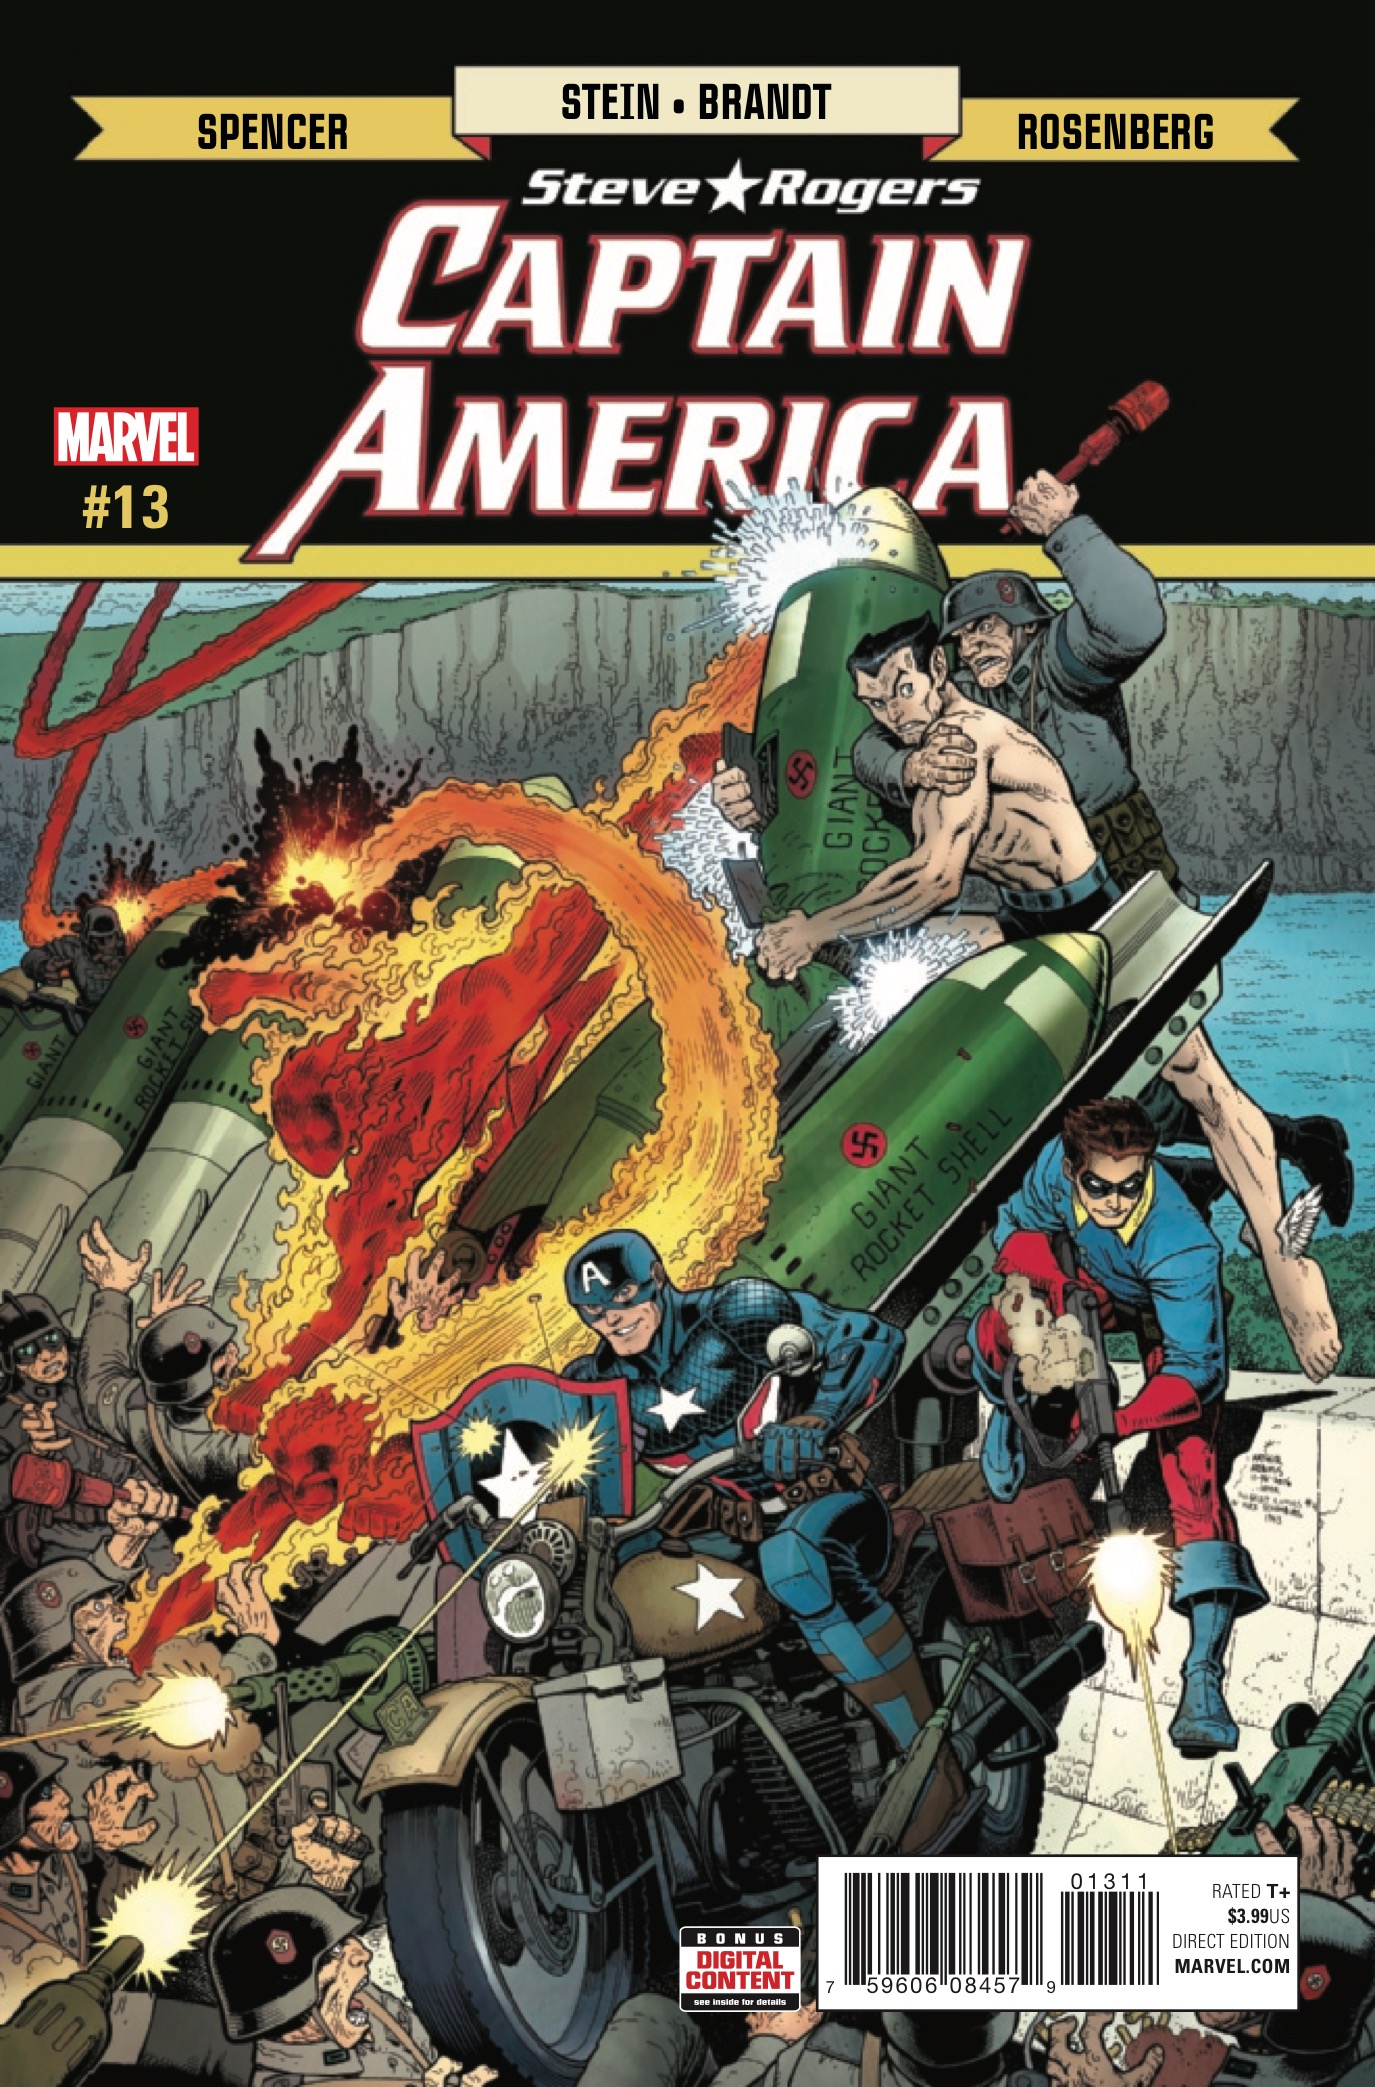 Captain America: Steve Rogers #13 Review